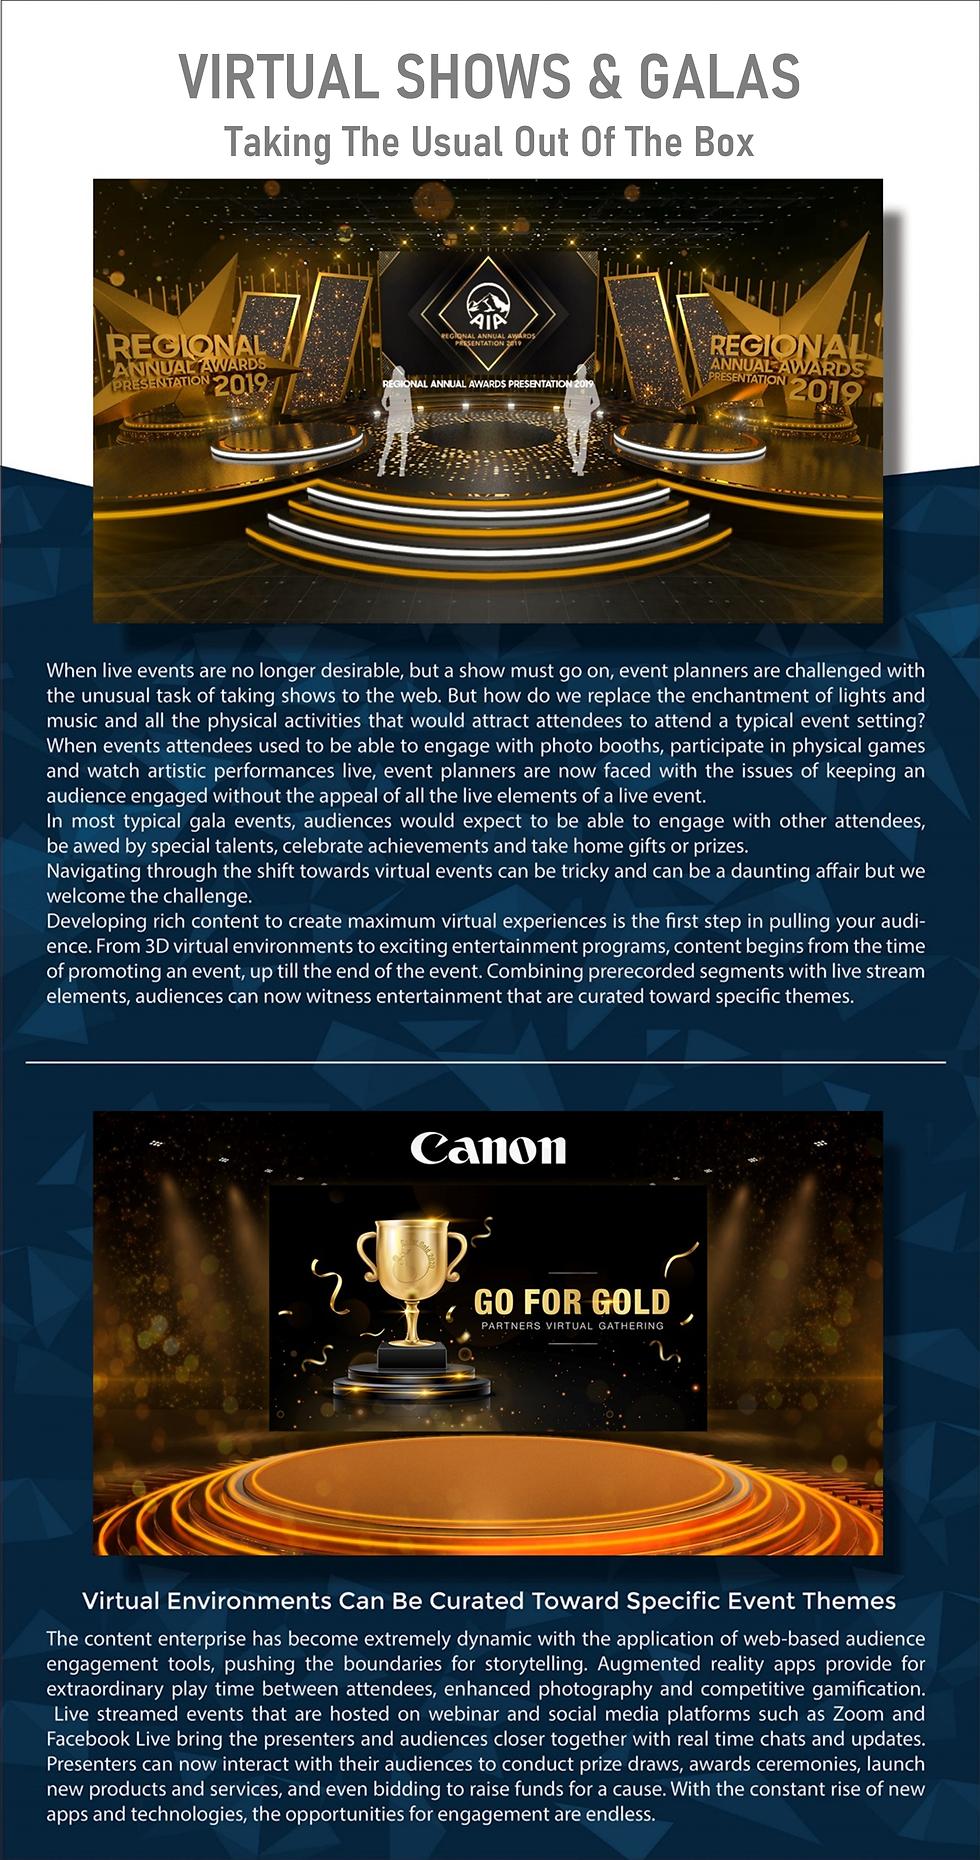 Virtual Shows & Gala v3.png